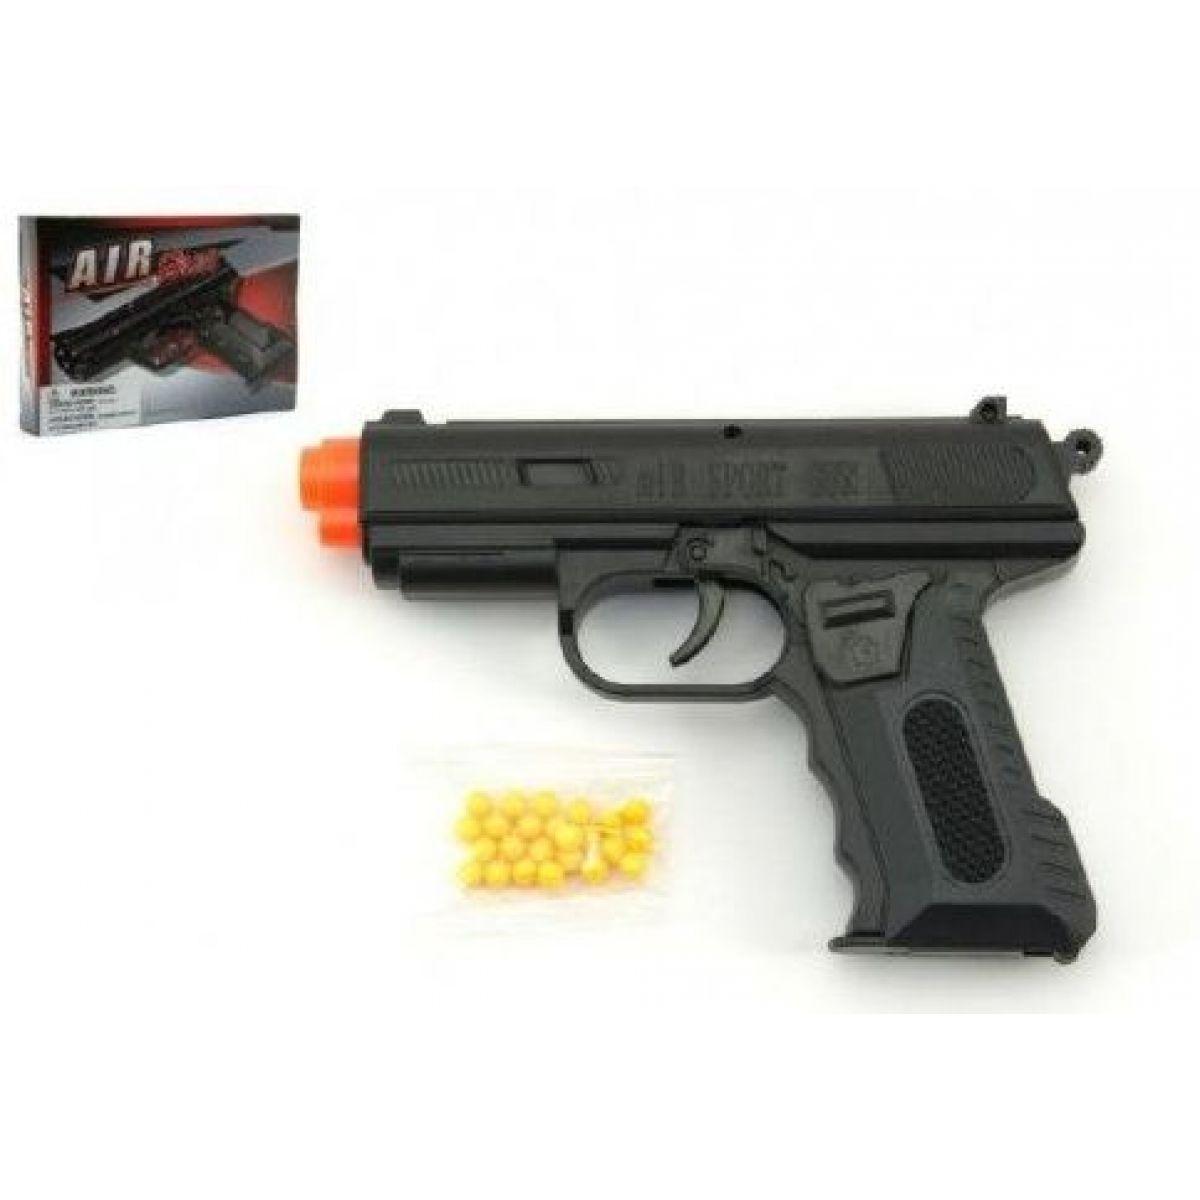 Pištoľ so zásobníkom na guličky